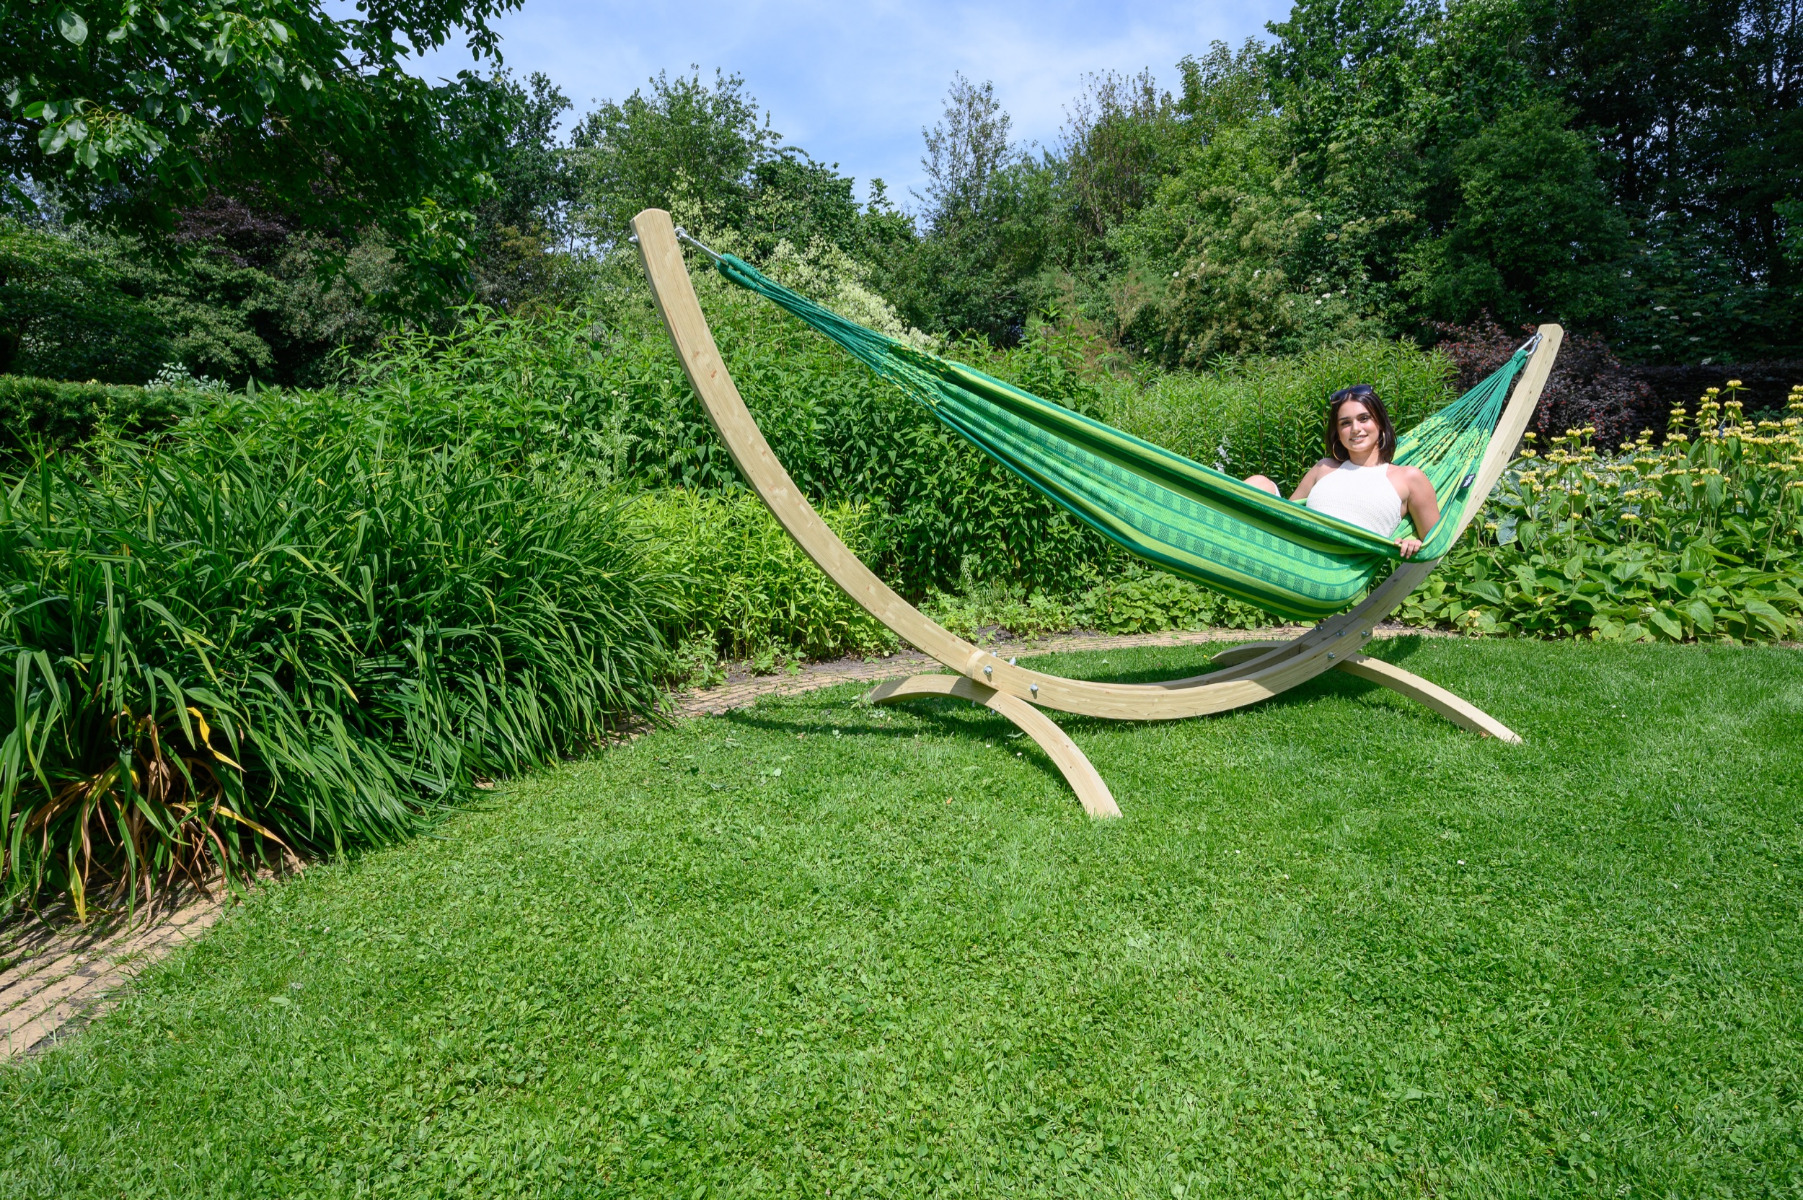 Hangmat 'Chill' Joyful - Tropilex �